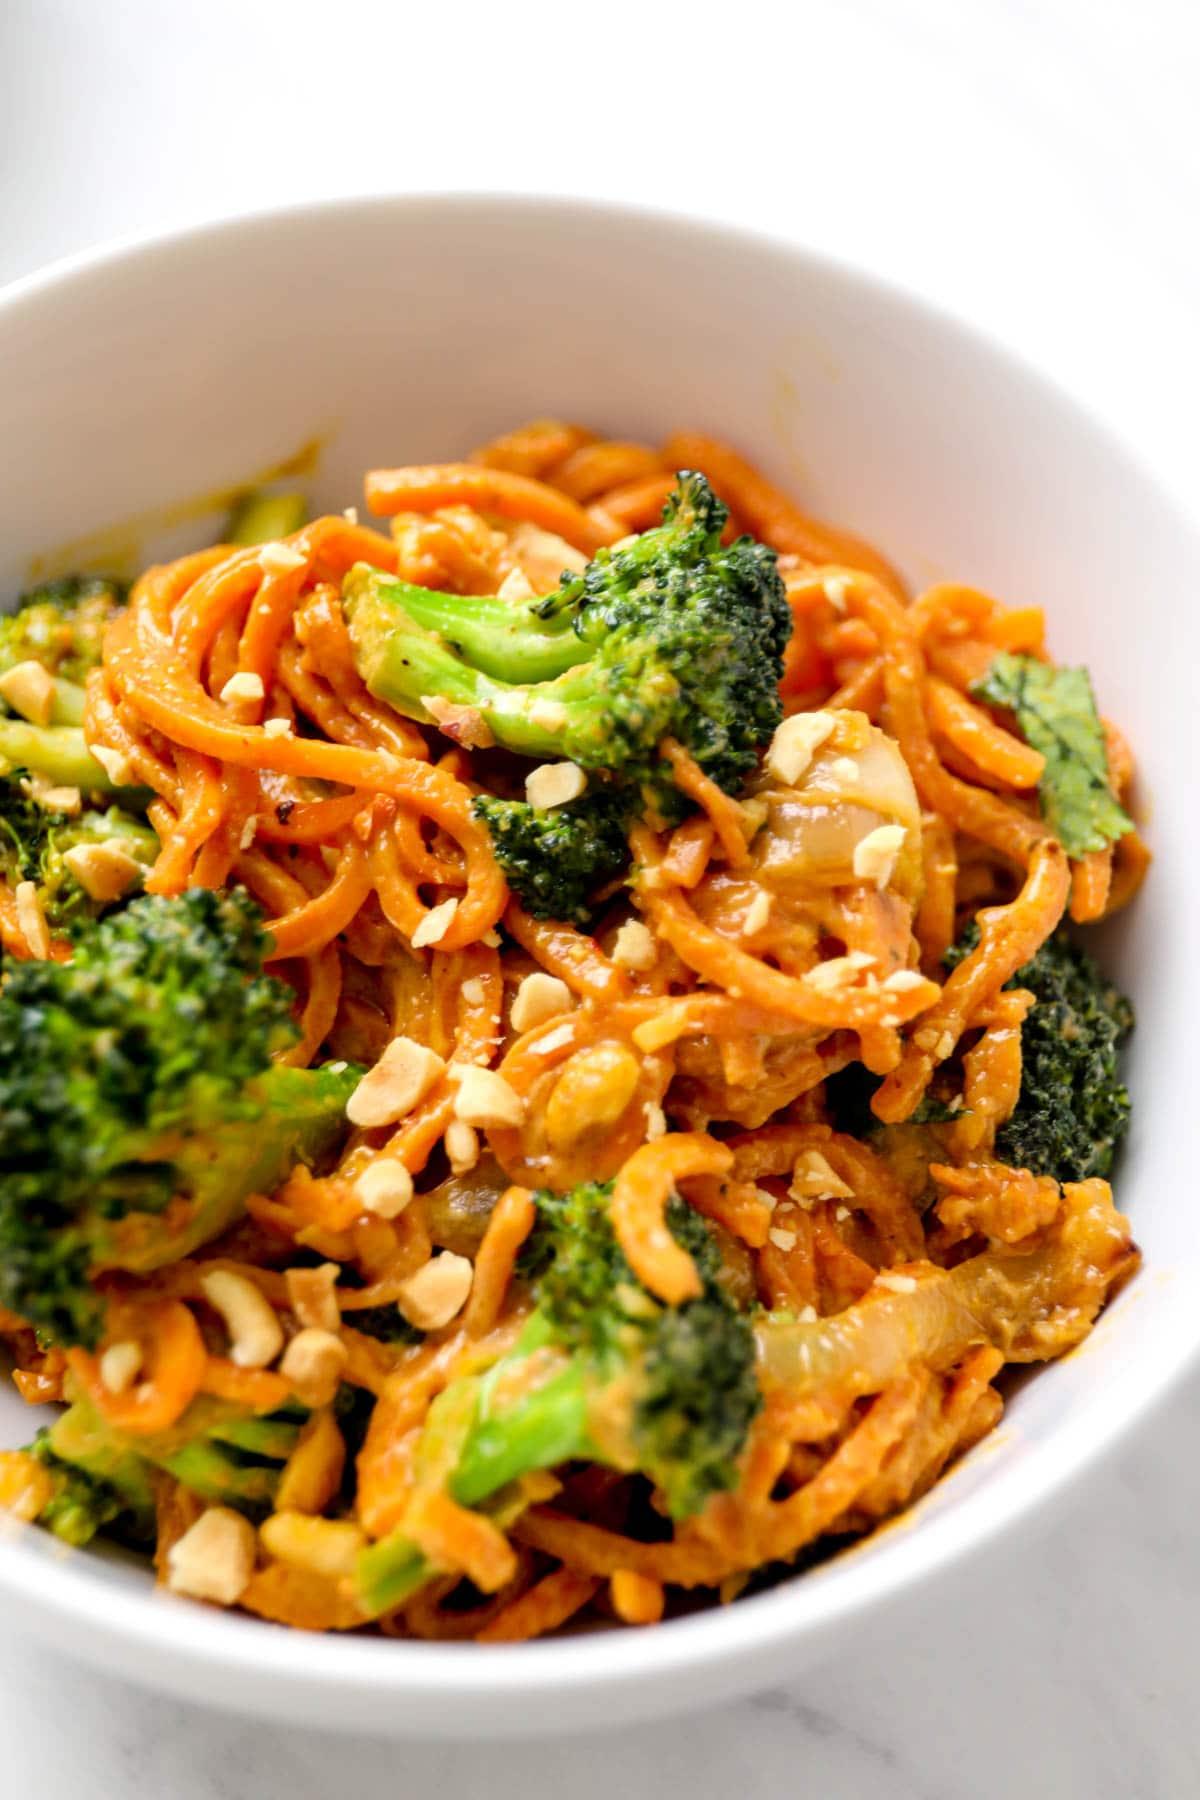 Peanut Sauce Sweet Potato Noodles with broccoli and chopped peanuts.